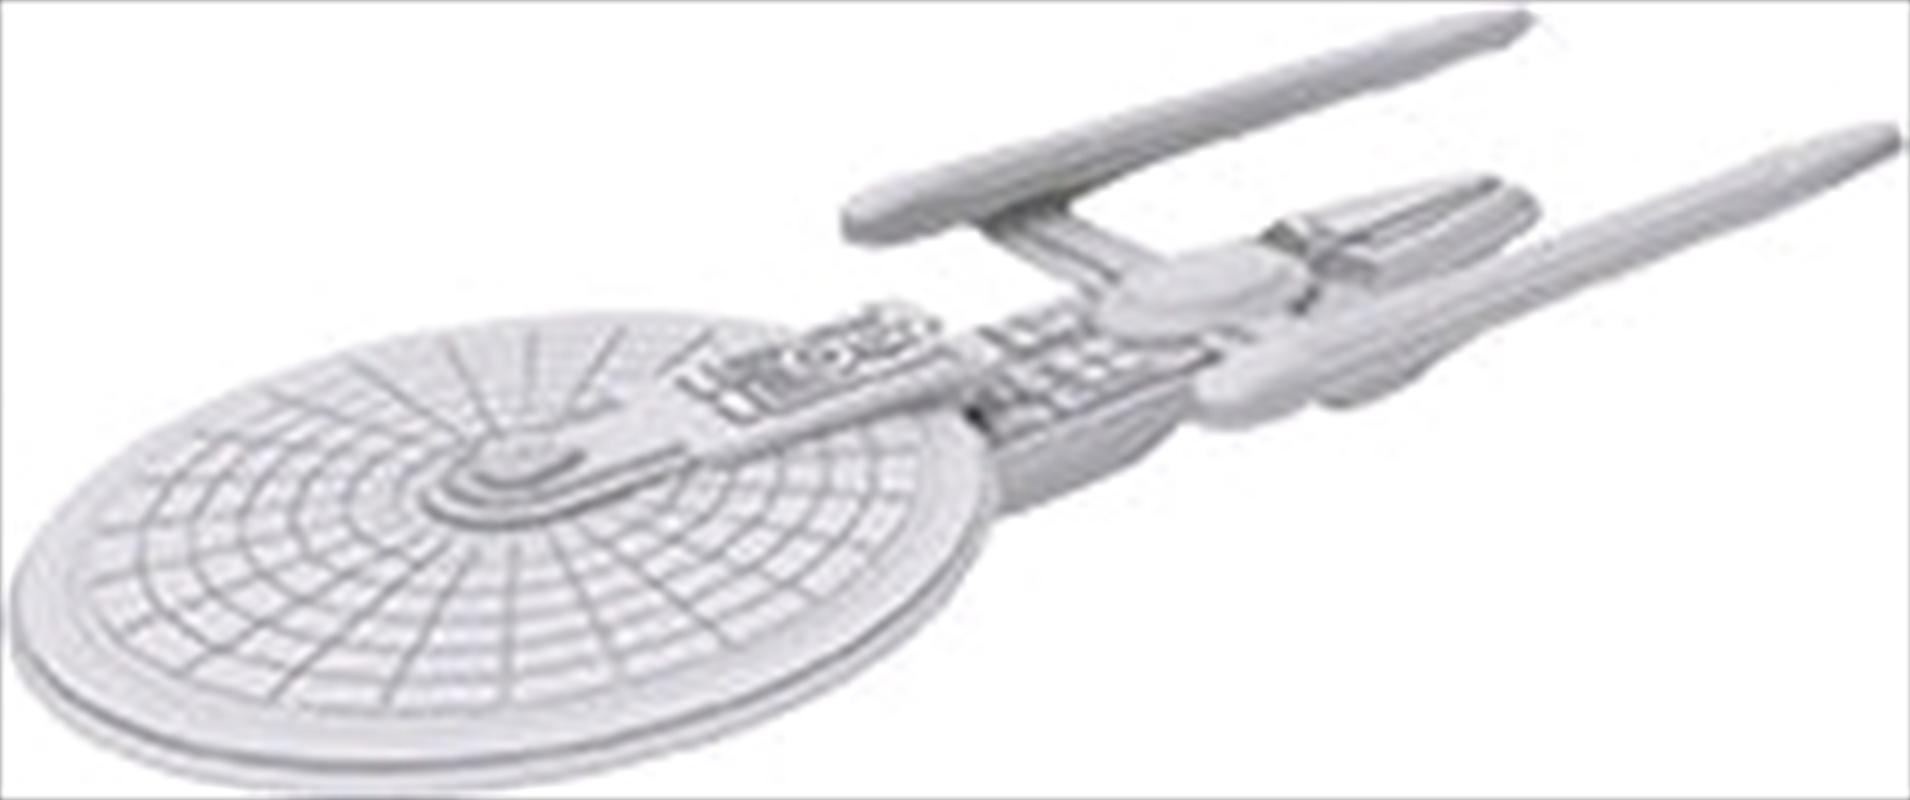 Star Trek - Unpainted Ships: Excelsior Class | Merchandise